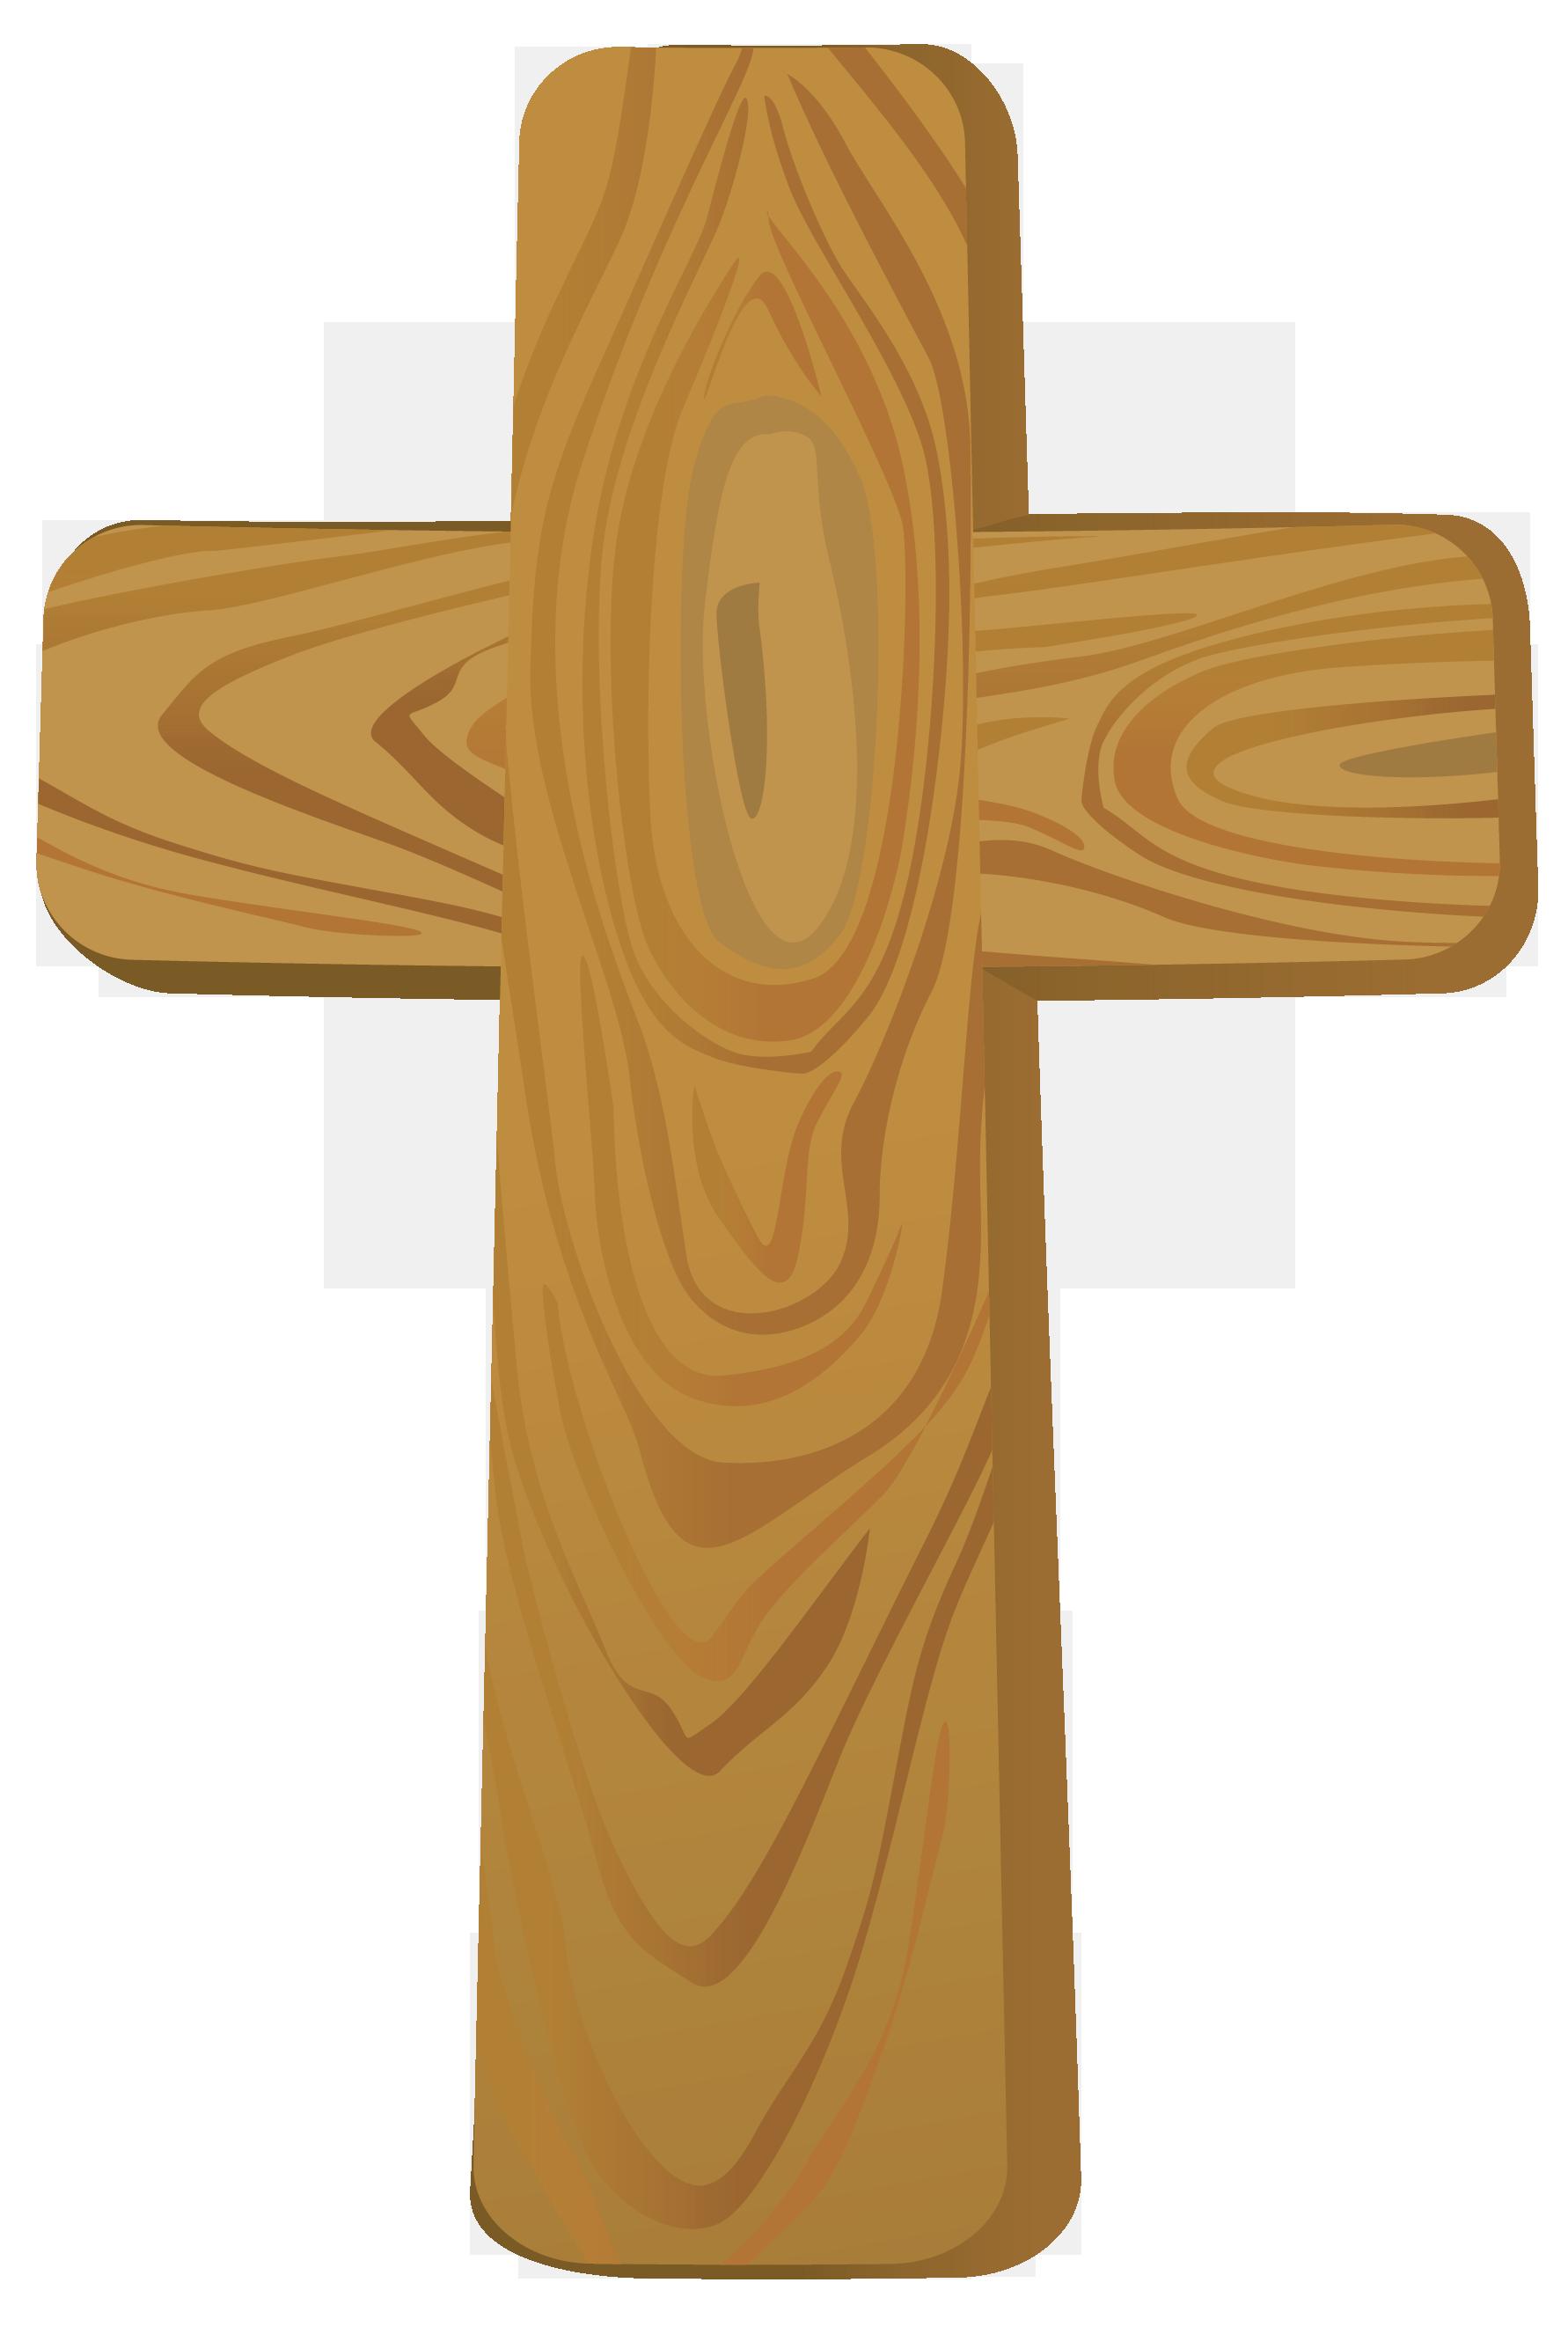 Wood Cross Clipart.